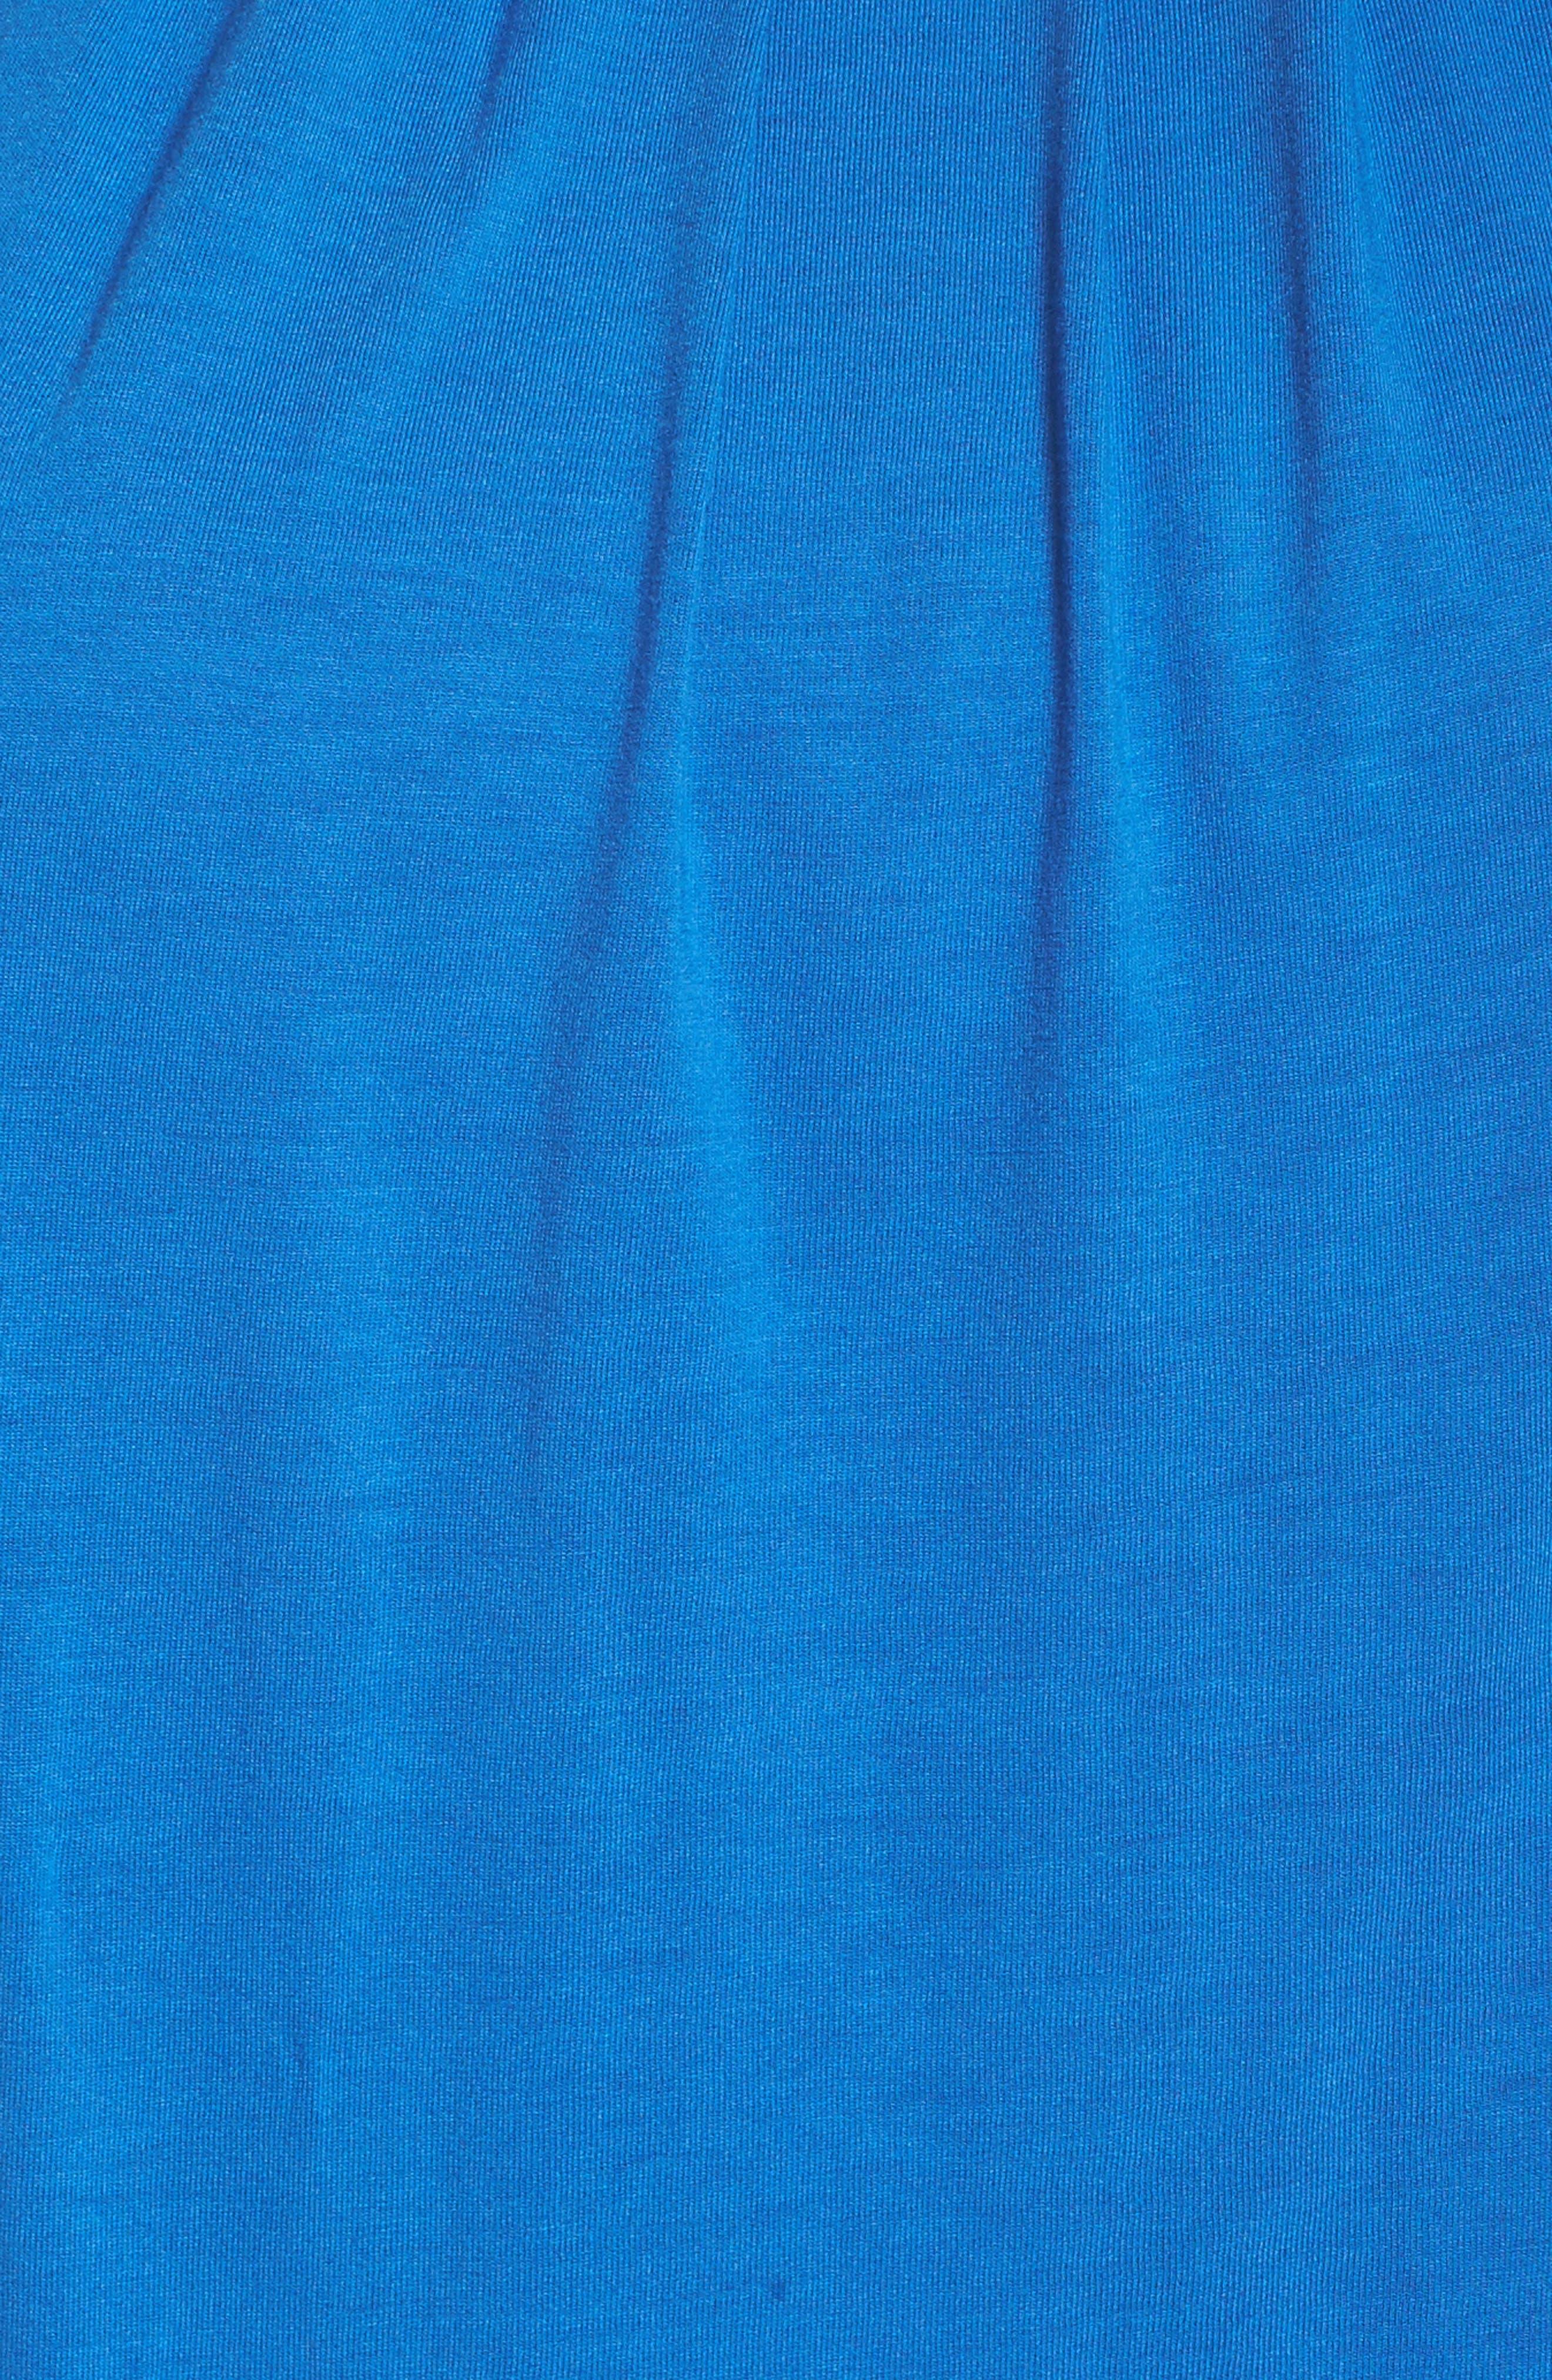 Pleated Cap Sleeve Tee,                             Alternate thumbnail 5, color,                             Blue Nautical